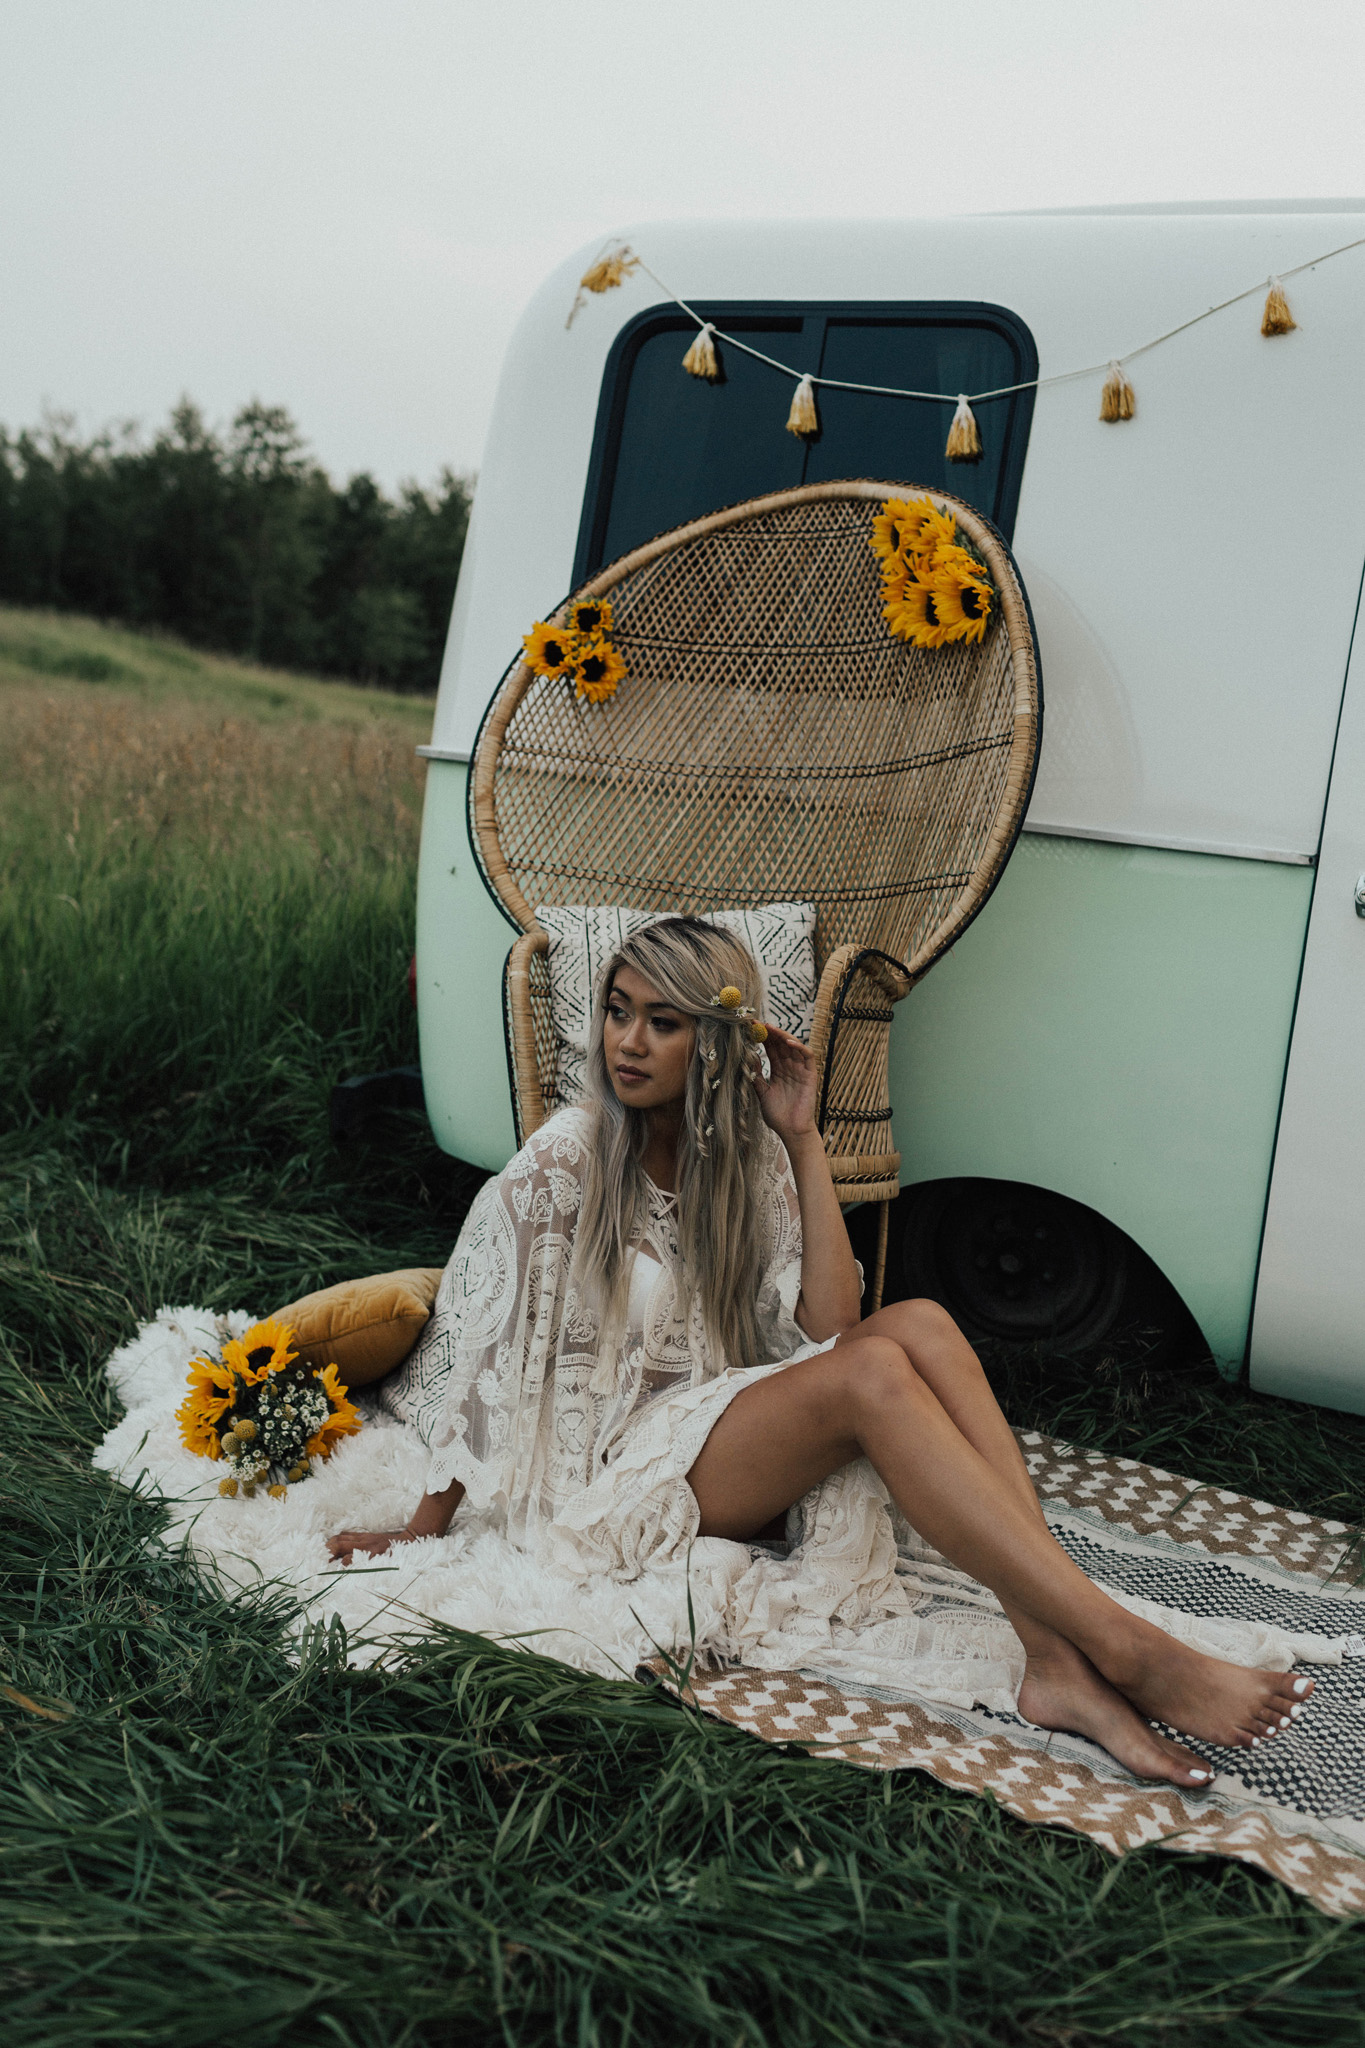 gypsy boler boudoir session - michelle larmand 043